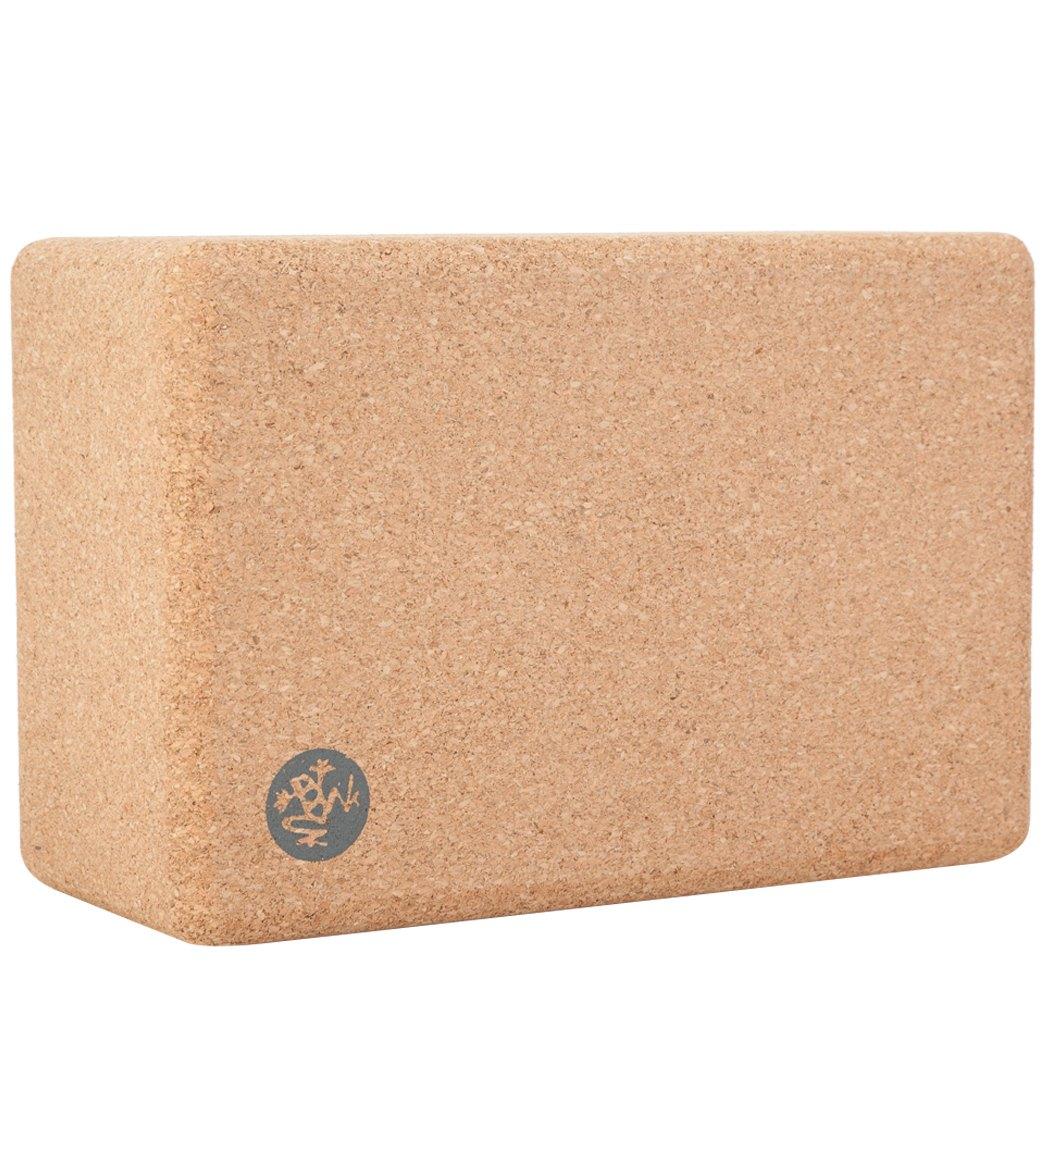 Yoga Blocks Target: Cork Yoga Blocks